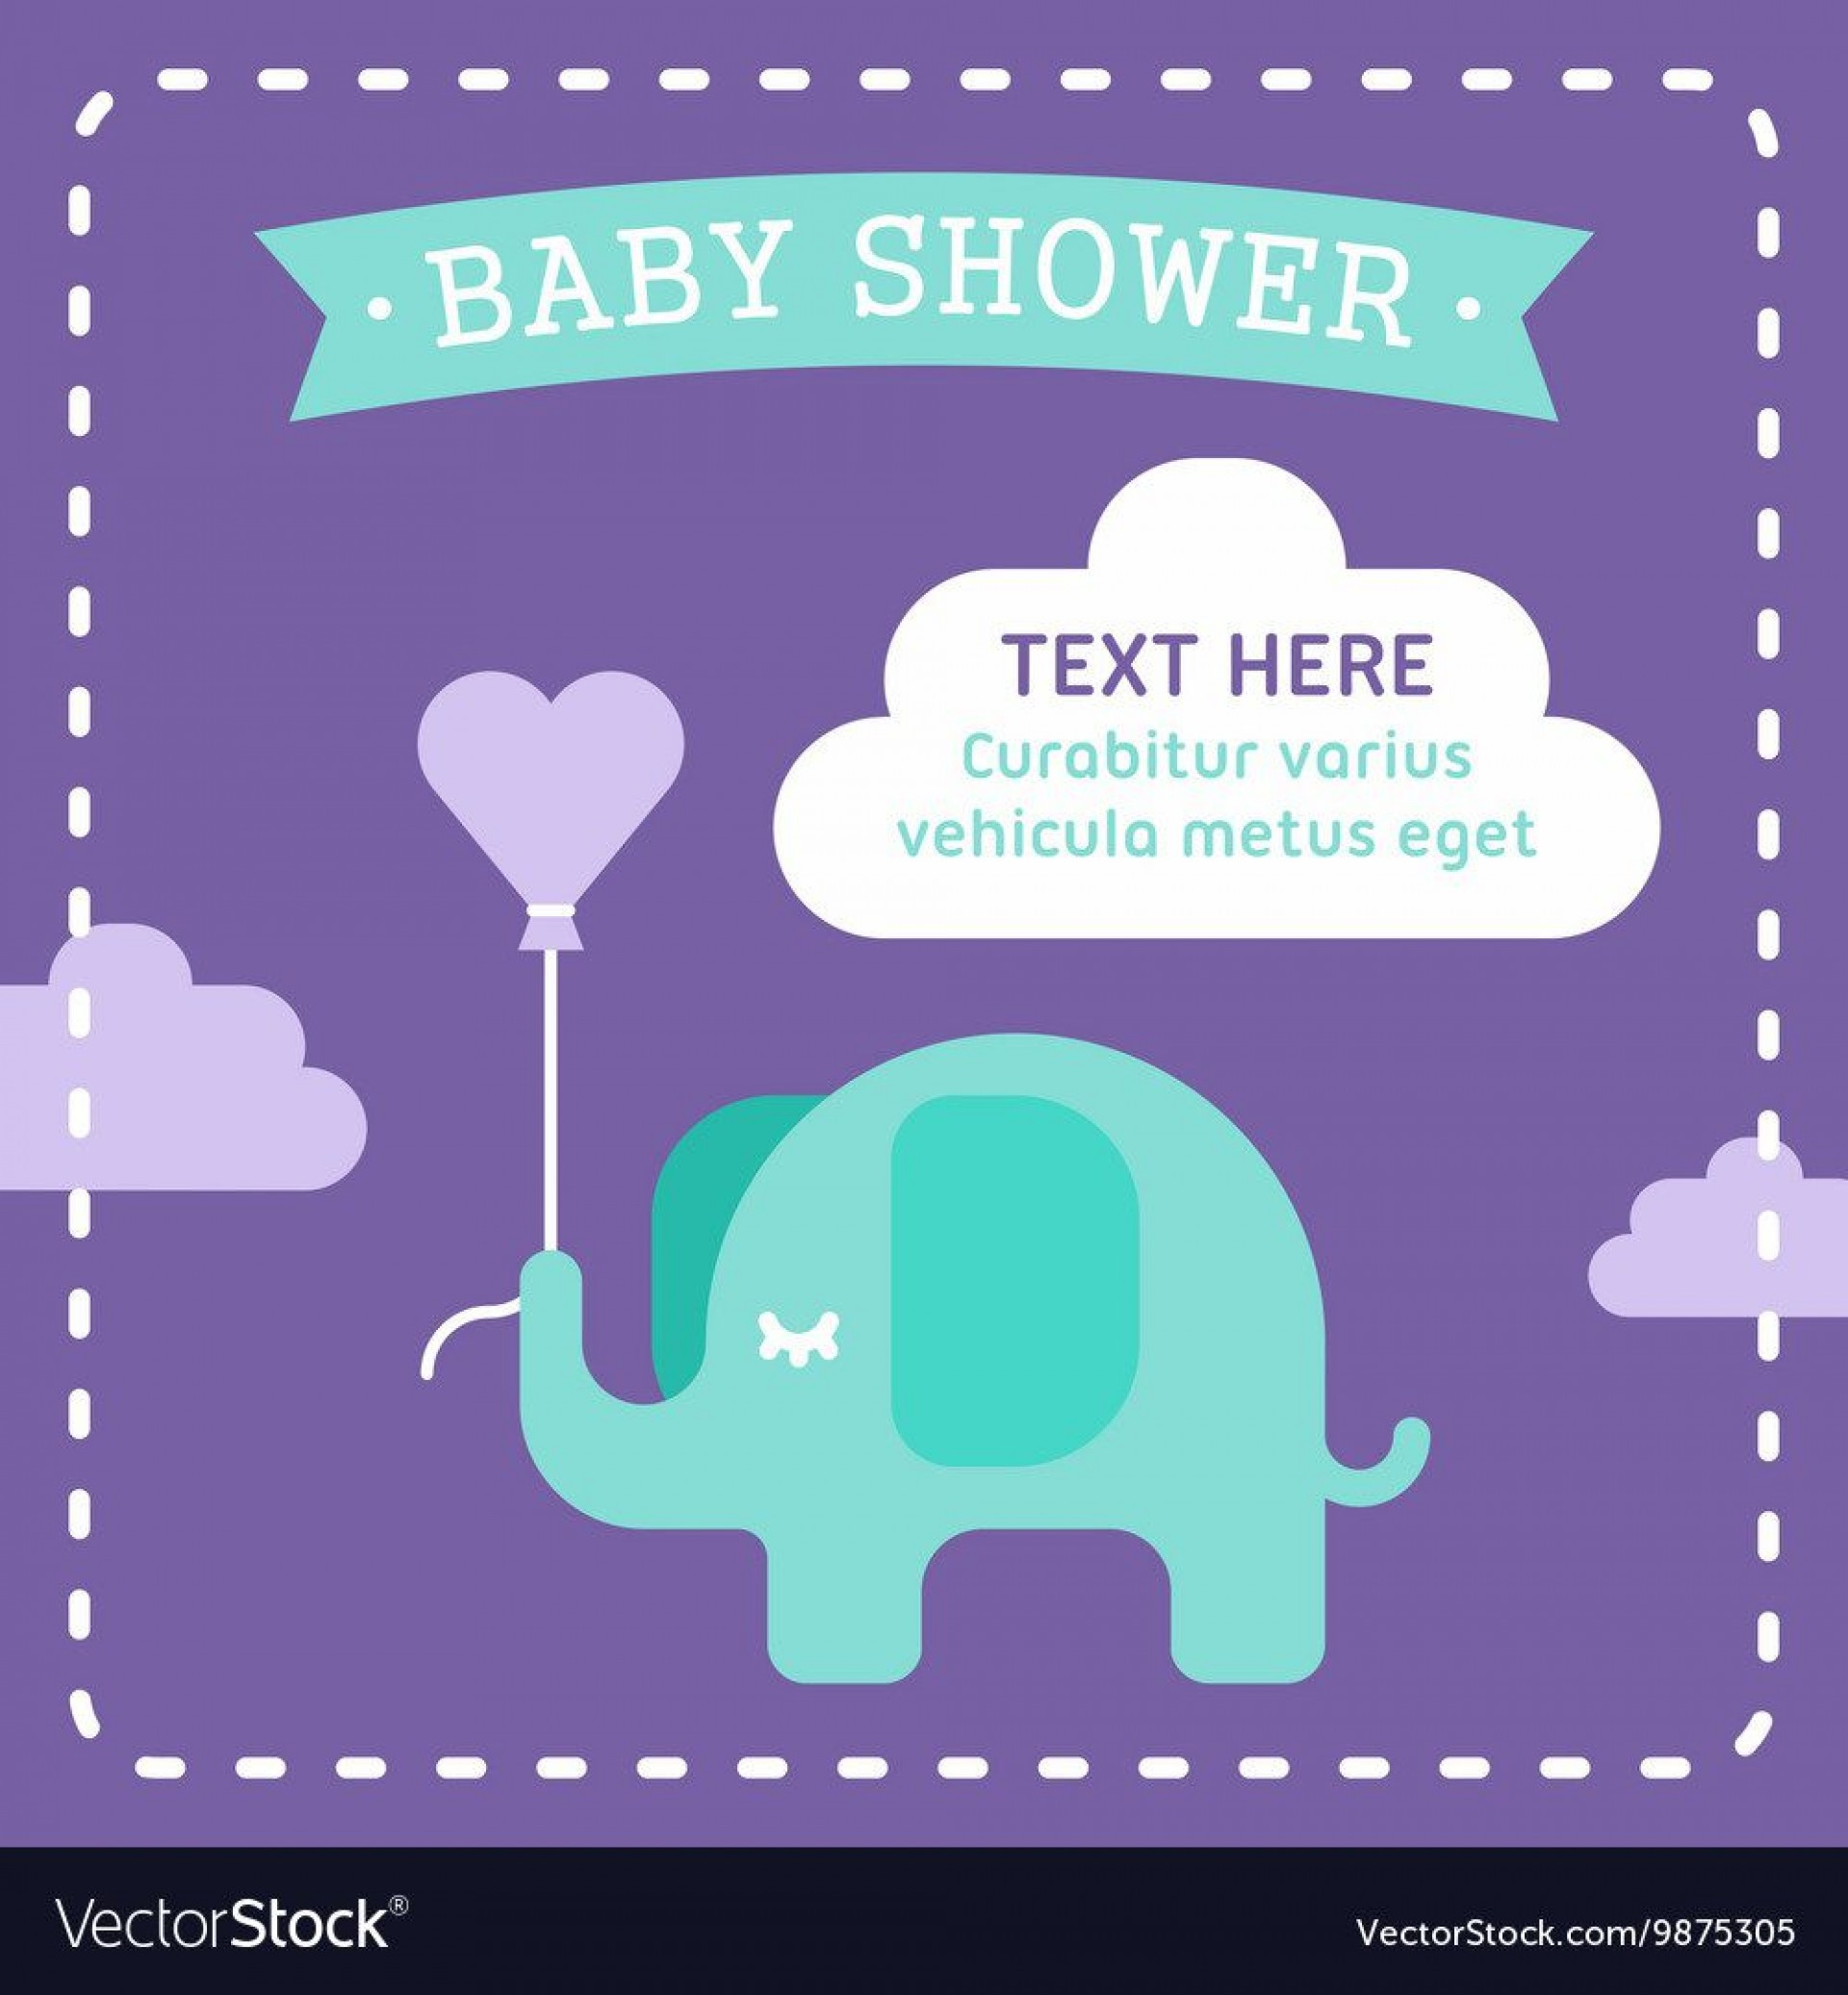 005 Sensational Elephant Baby Shower Invitation Template Concept  Templates Free Pdf Boy1920